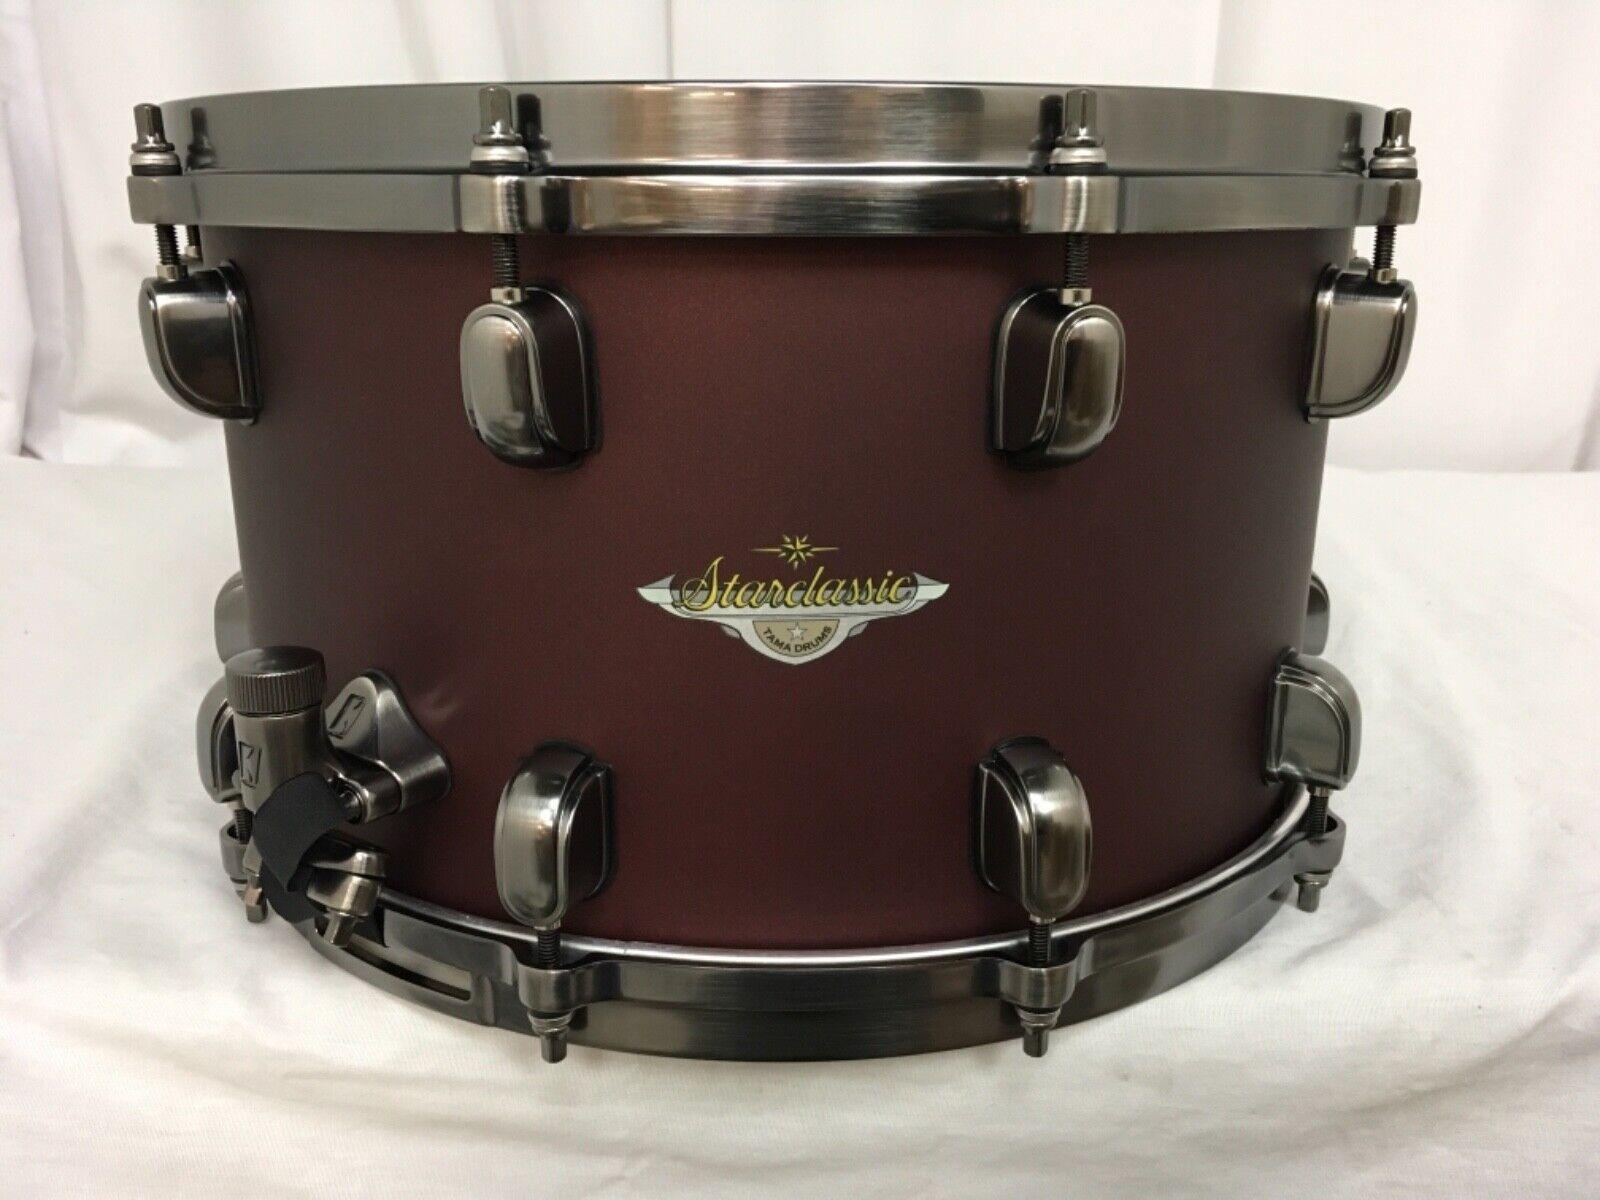 Tama Starclassic Maple 14  X 8  Snare Drum Flat Burgandy Metallic MAS148U-FBM